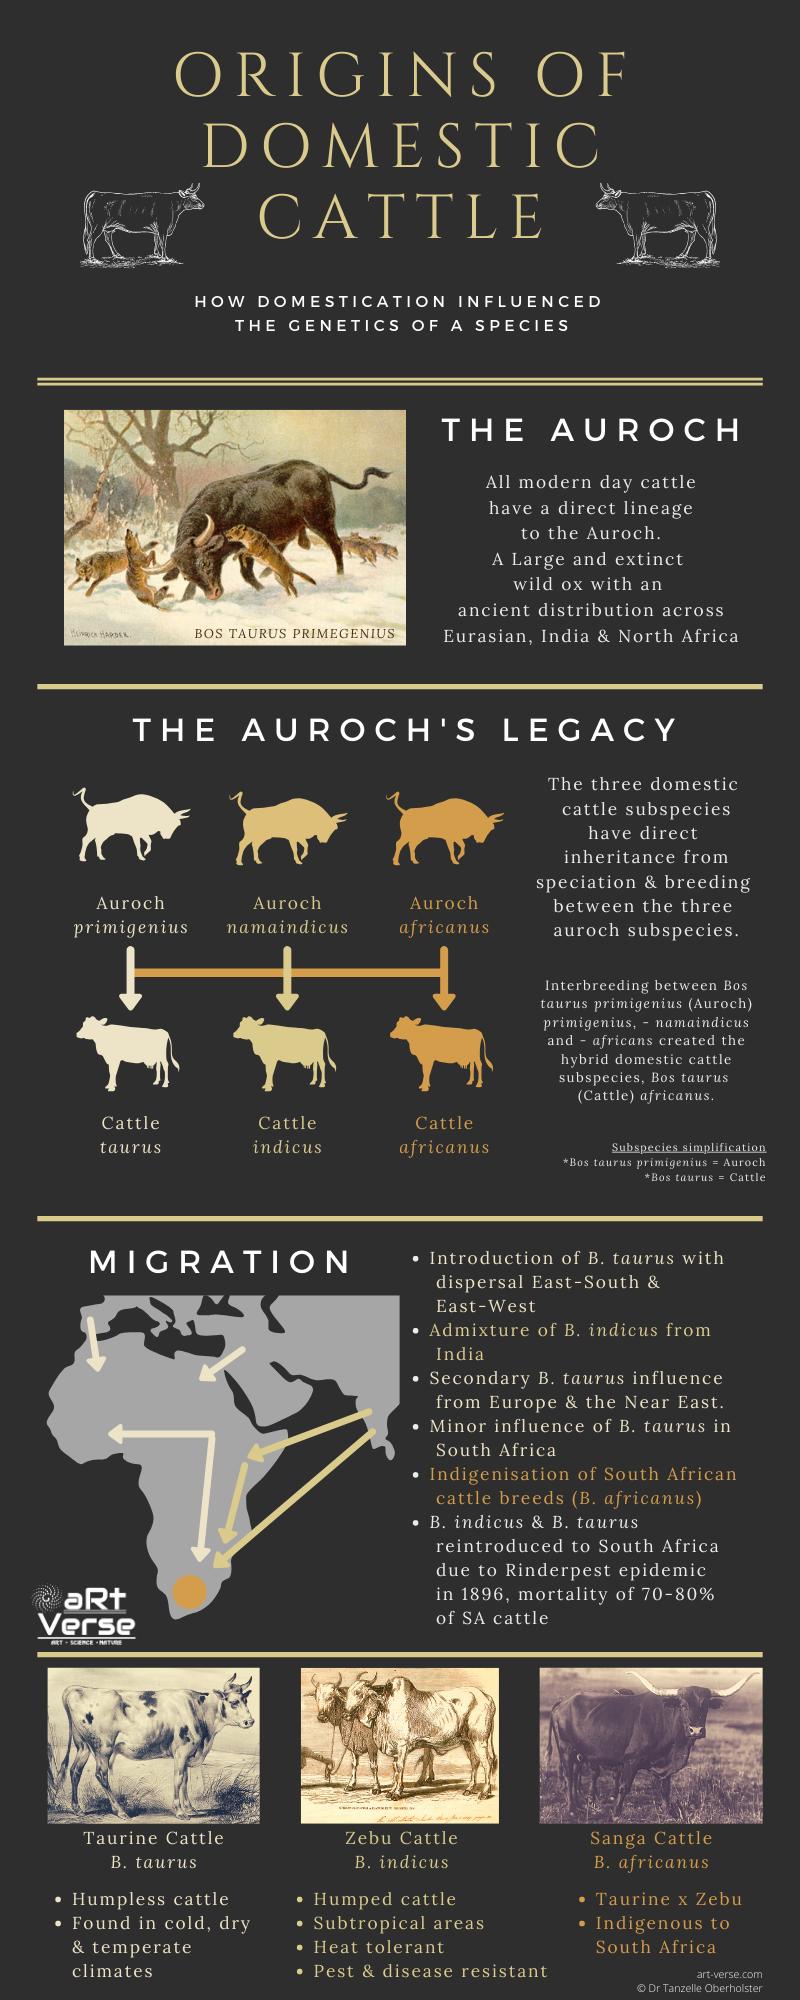 Domestic Origin of Cattle, Tanzelle Oberholster, aRtVerse, art-verse.com, cave painting, popular science article, infographic, genetics, migration, domestication, auroch, taurine, zebu, sanga, cattle, taurus, indicus, africanus